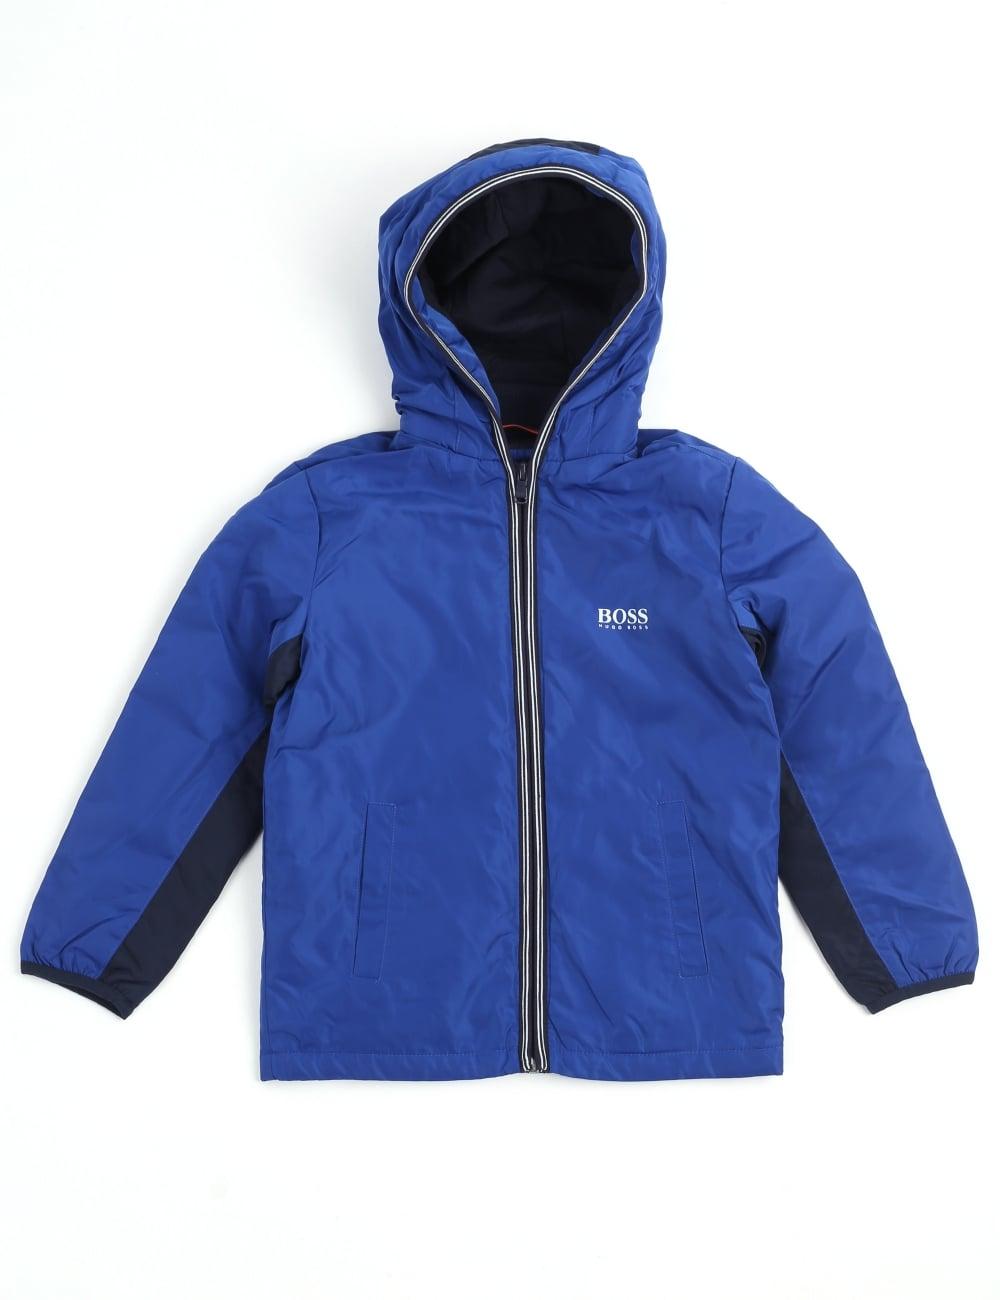 5e124eec6bc7 Hugo Boss Boys Youth Zip Through Hooded Jacket